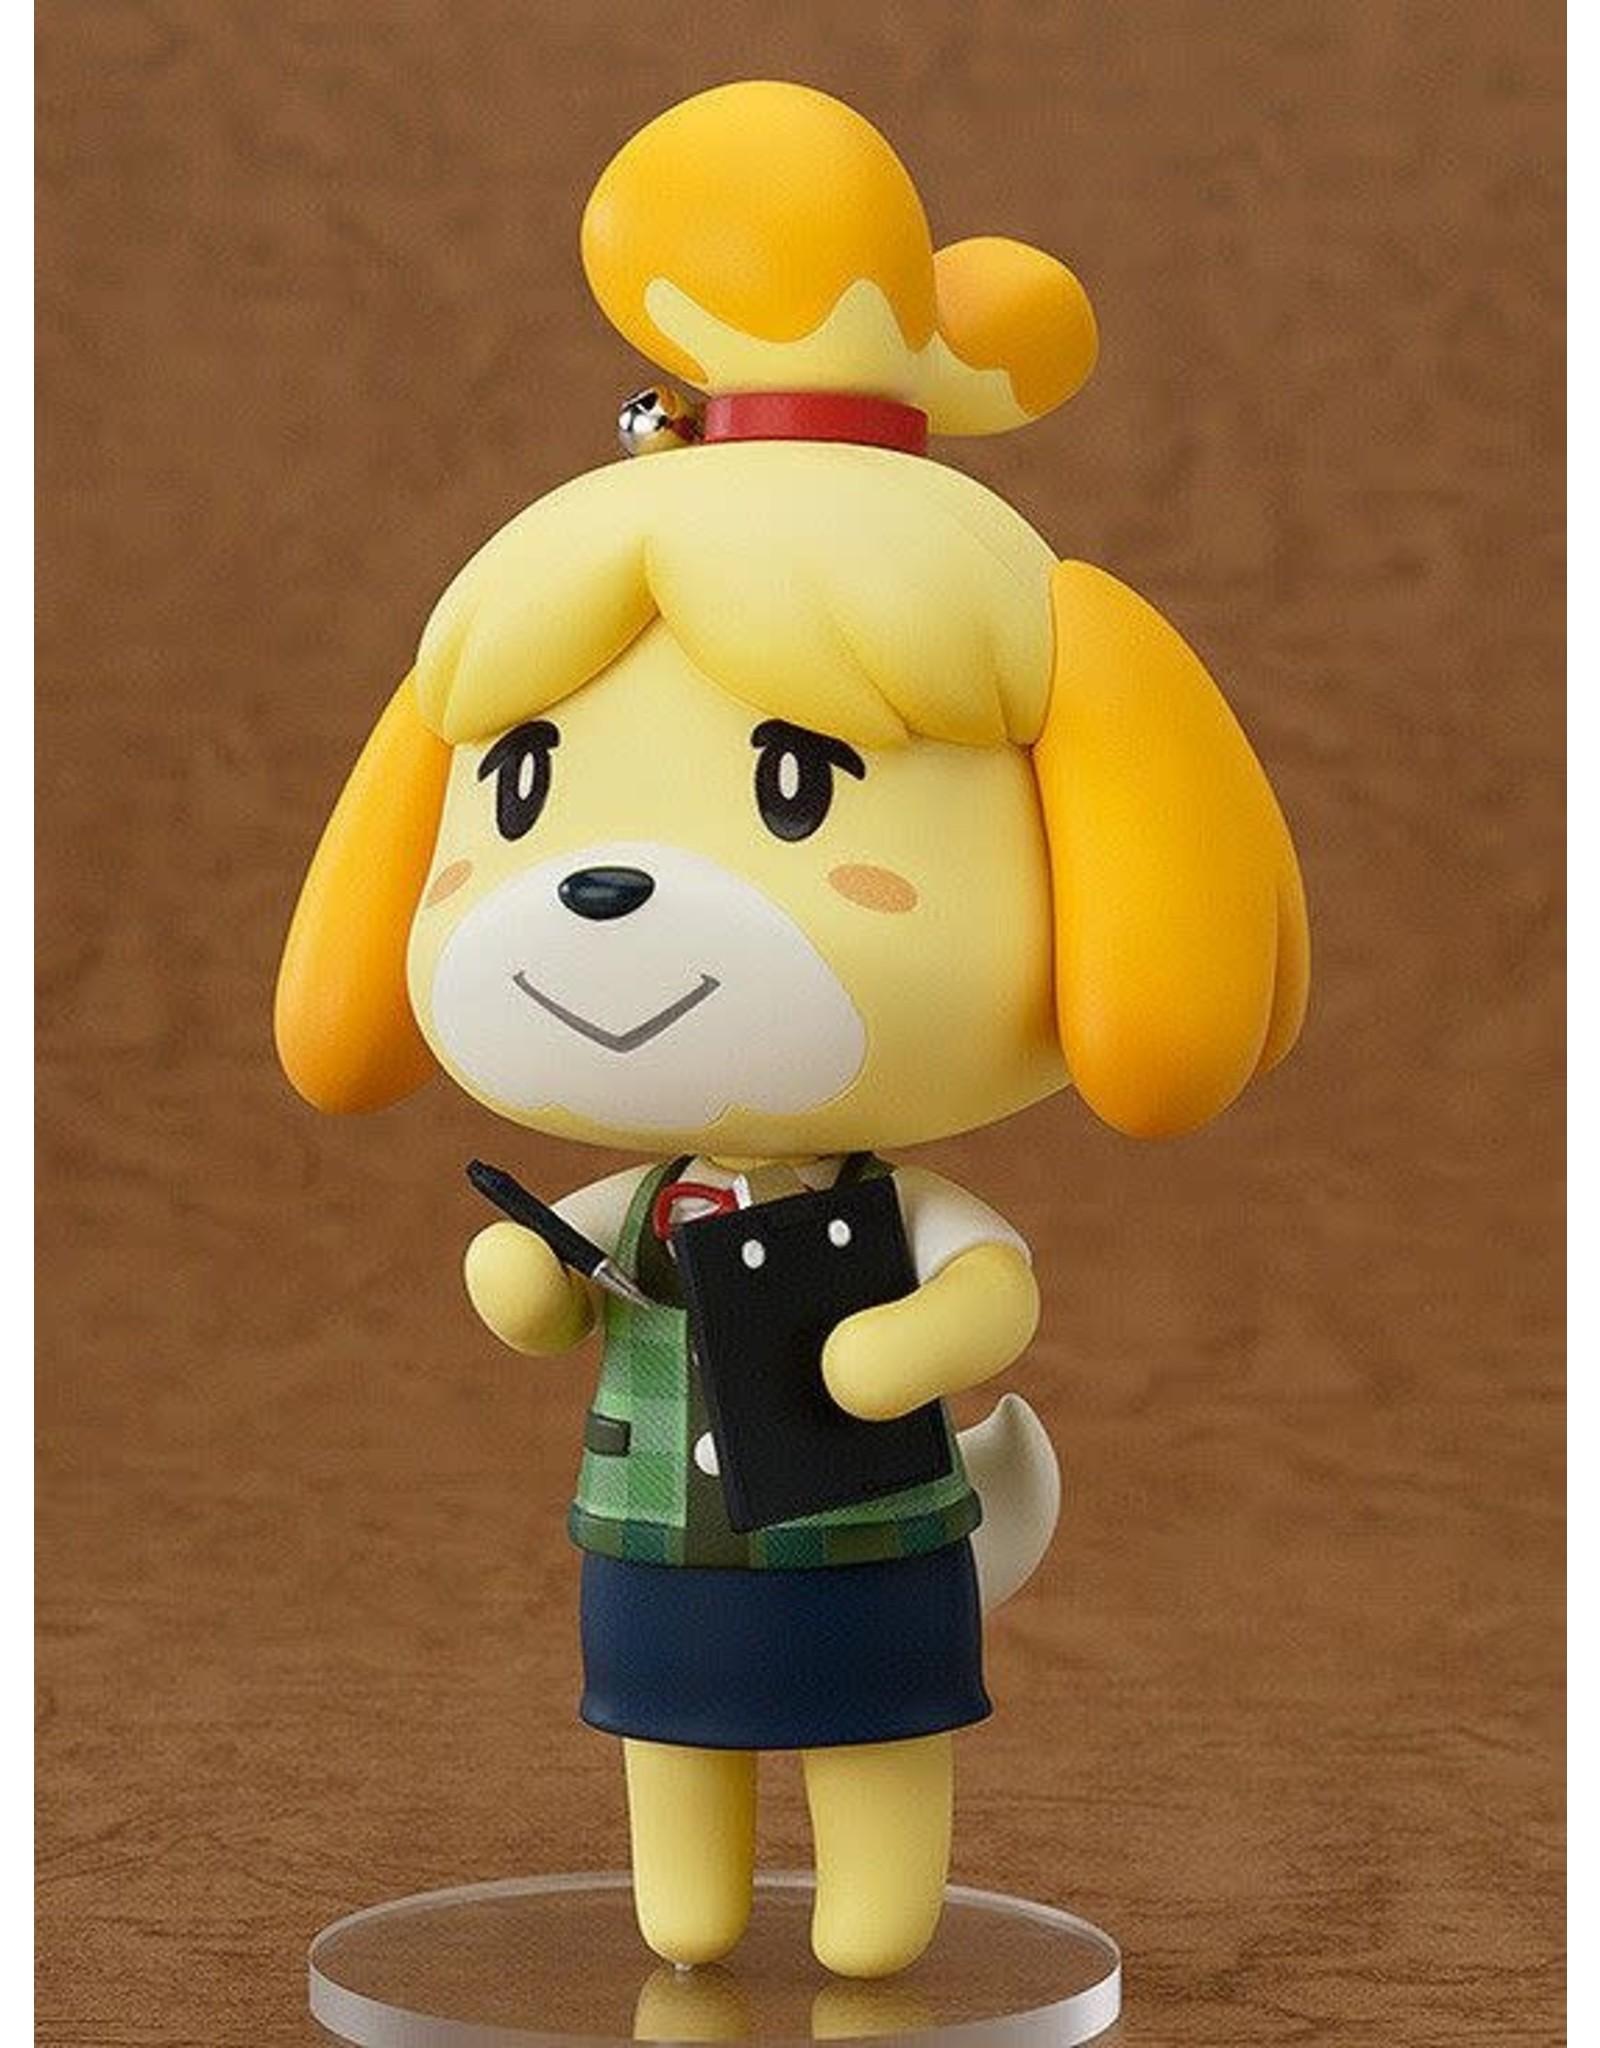 Good Smile Company ANIMAL CROSSING Figure Nendoroid 10cm - Shizue Isabelle